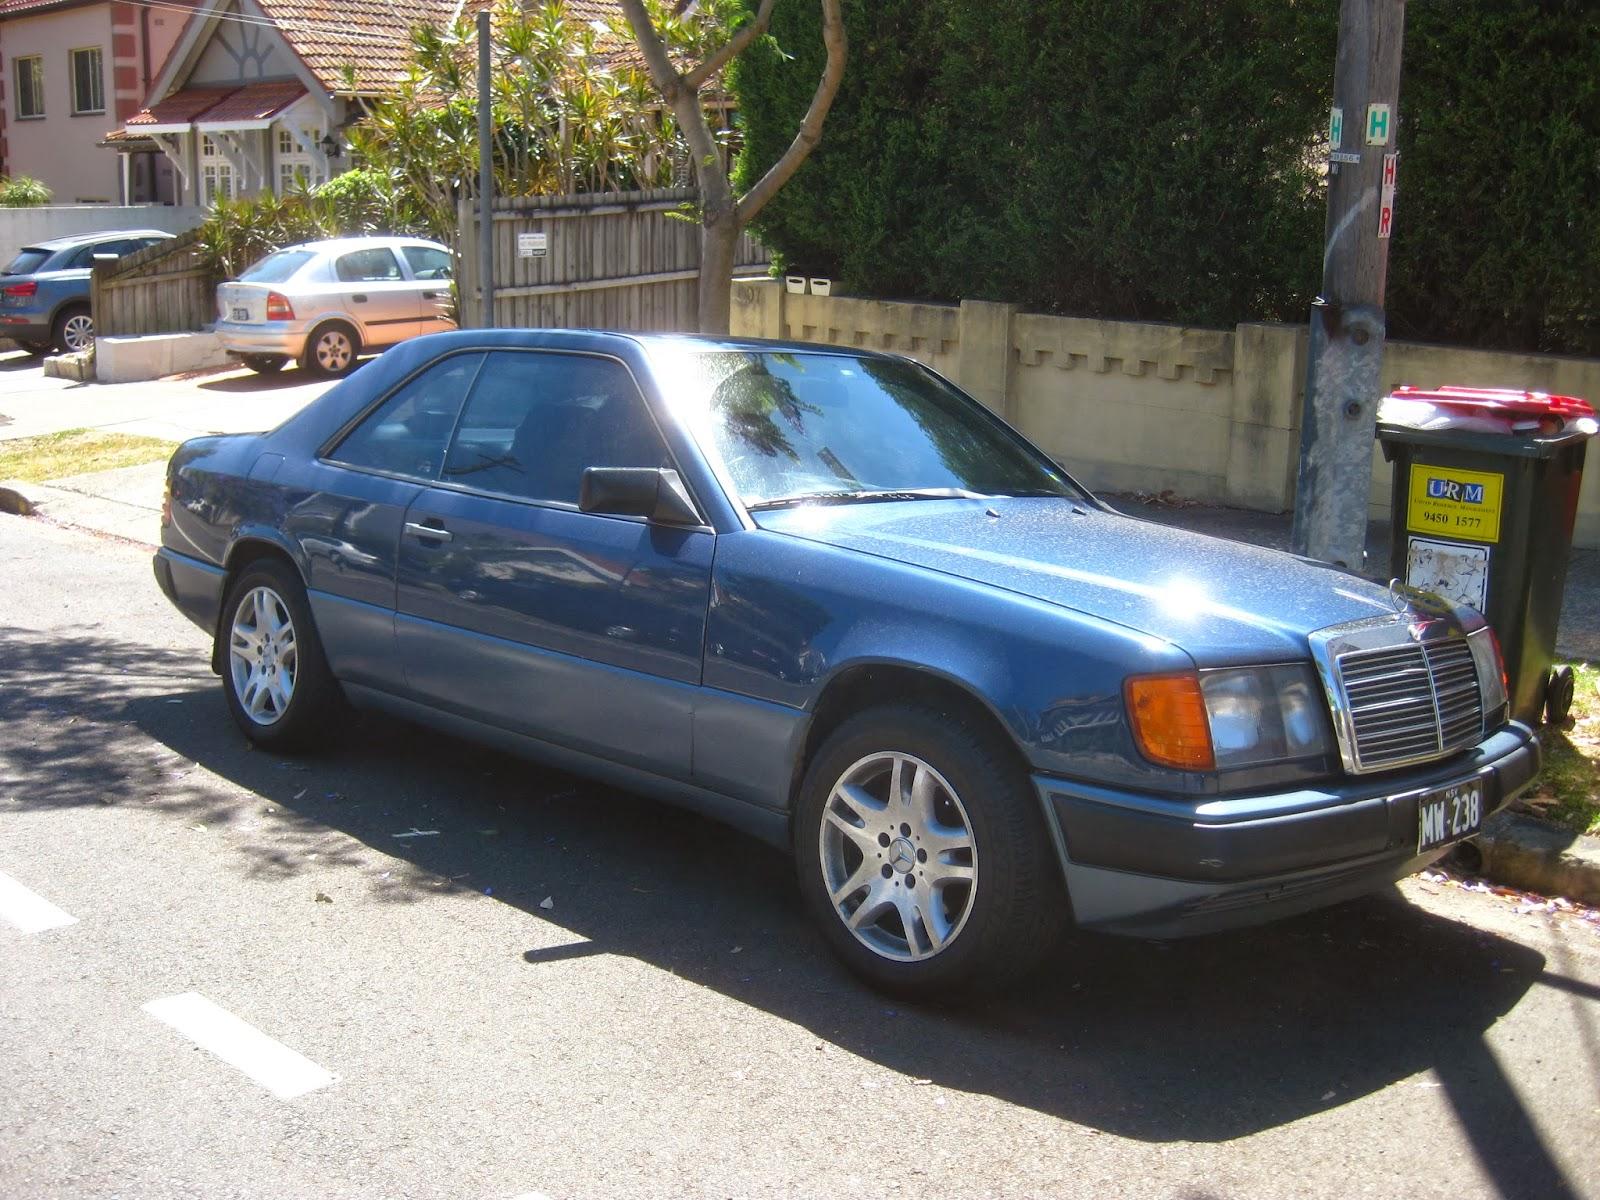 aussie old parked cars 1989 mercedes benz w124 300 ce. Black Bedroom Furniture Sets. Home Design Ideas